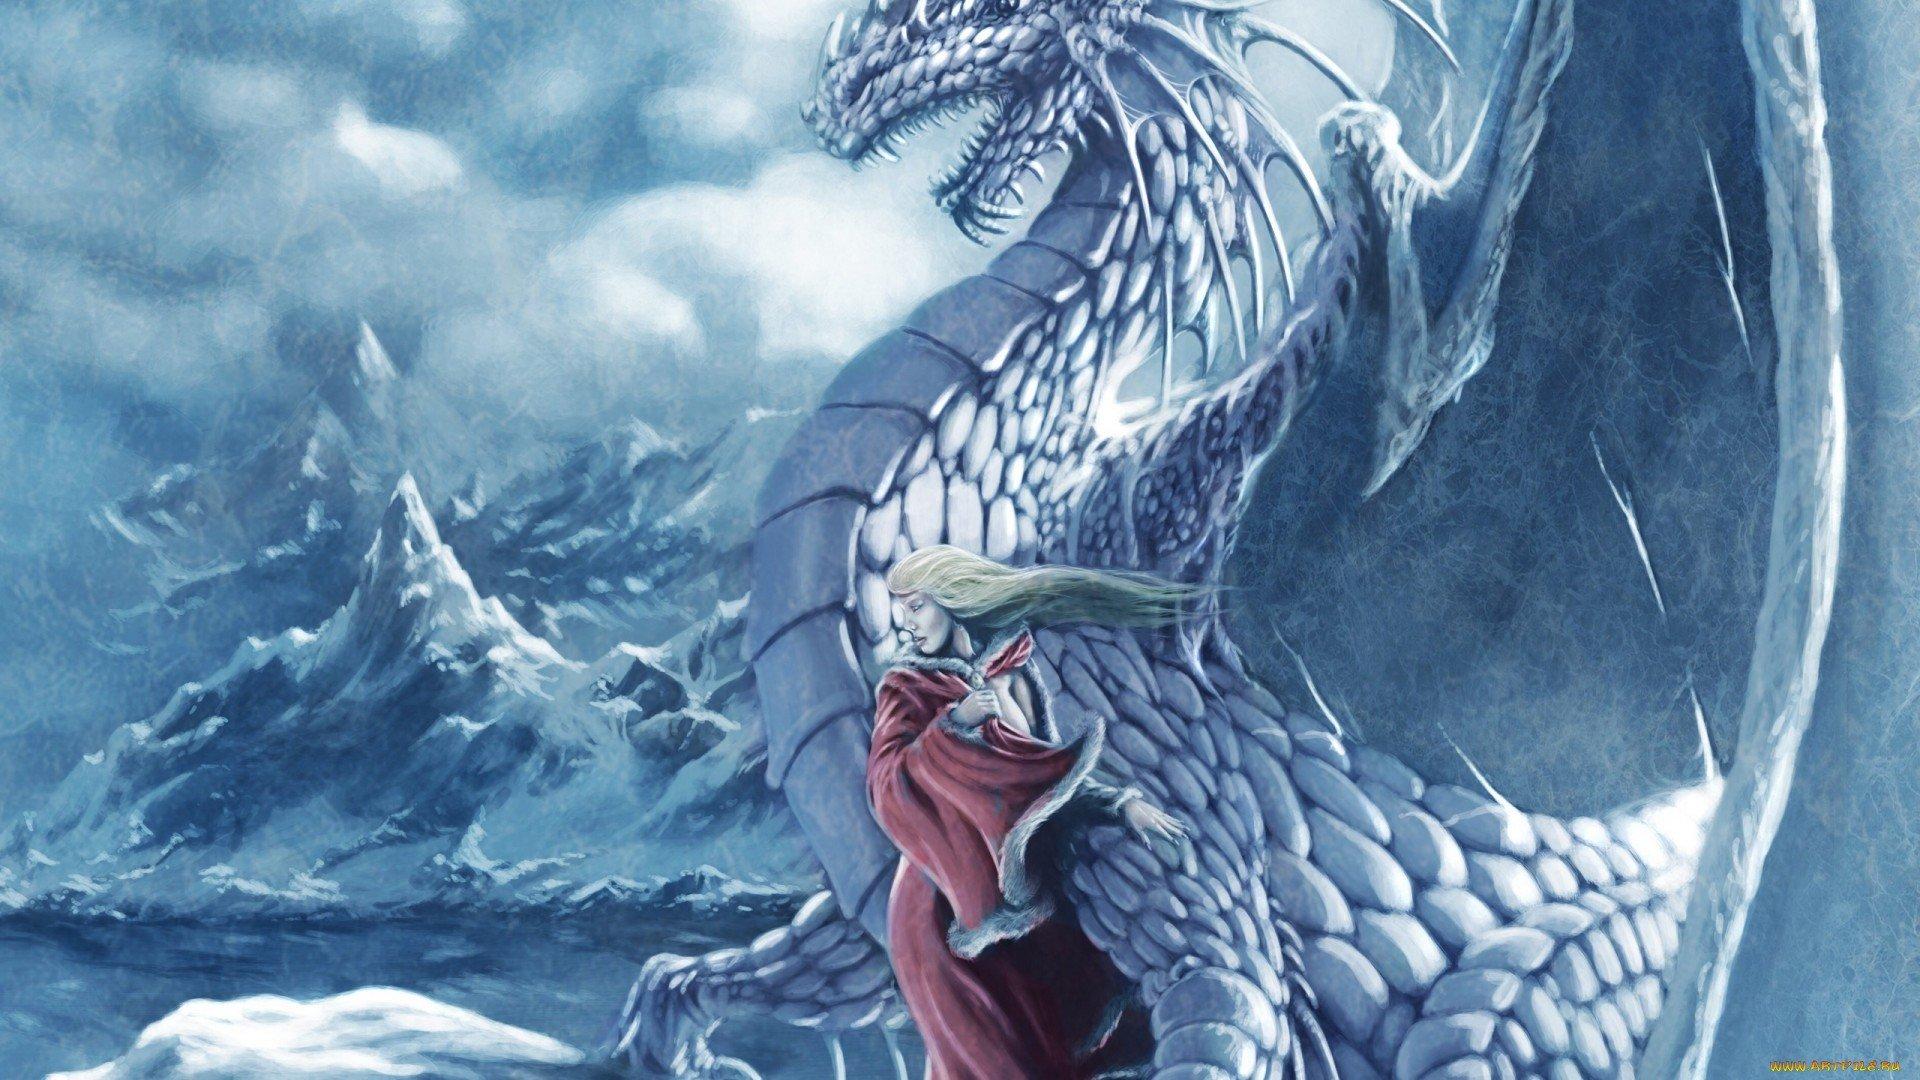 Ice Dragon Wallpaper Phone For Free Wallpaper - Dragon Wallpaper Ice - HD Wallpaper